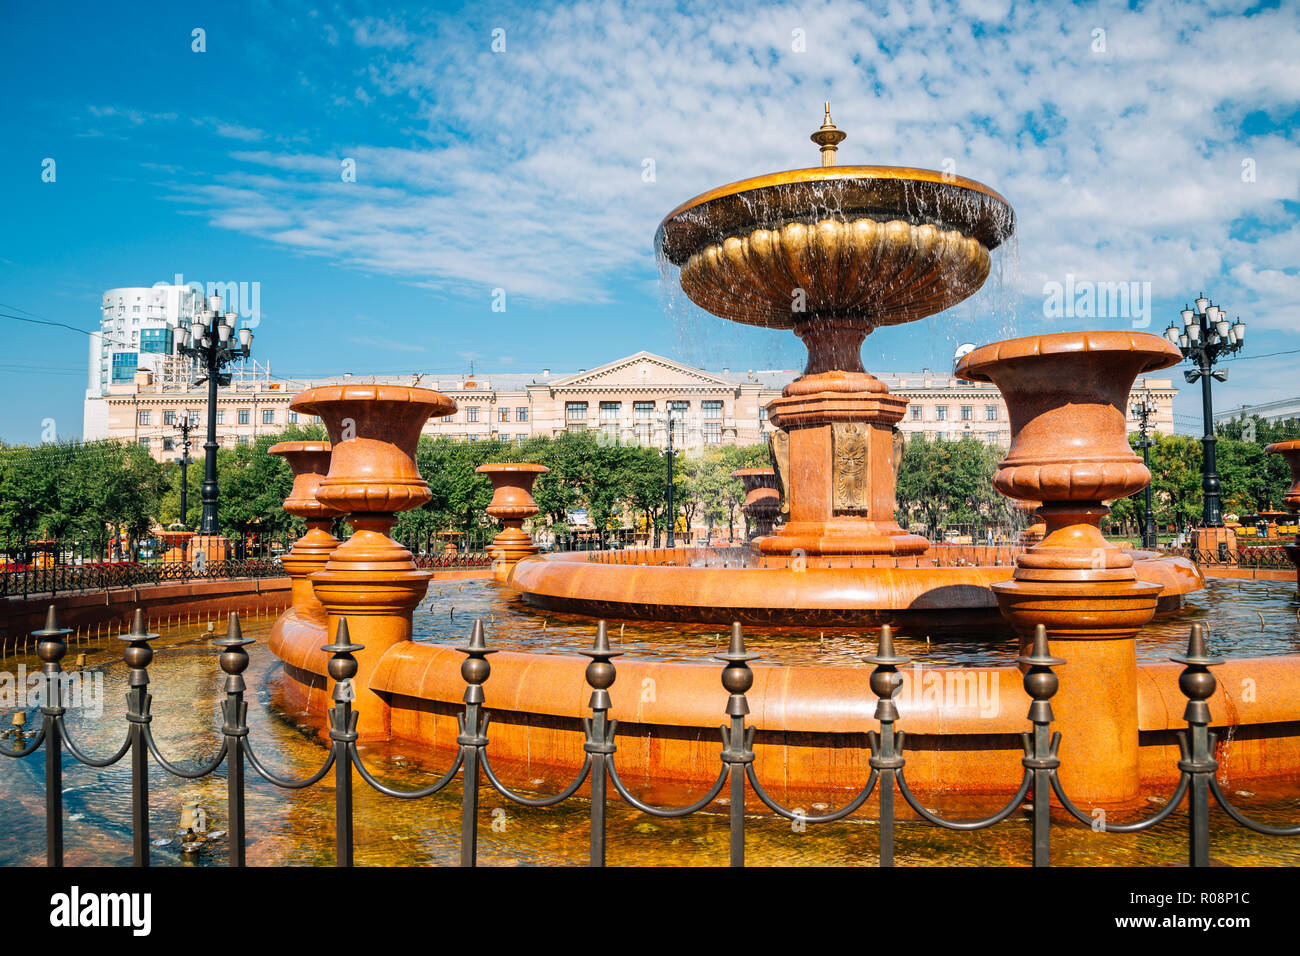 Lenin square fountain in Khabarovsk, Russia - Stock Image